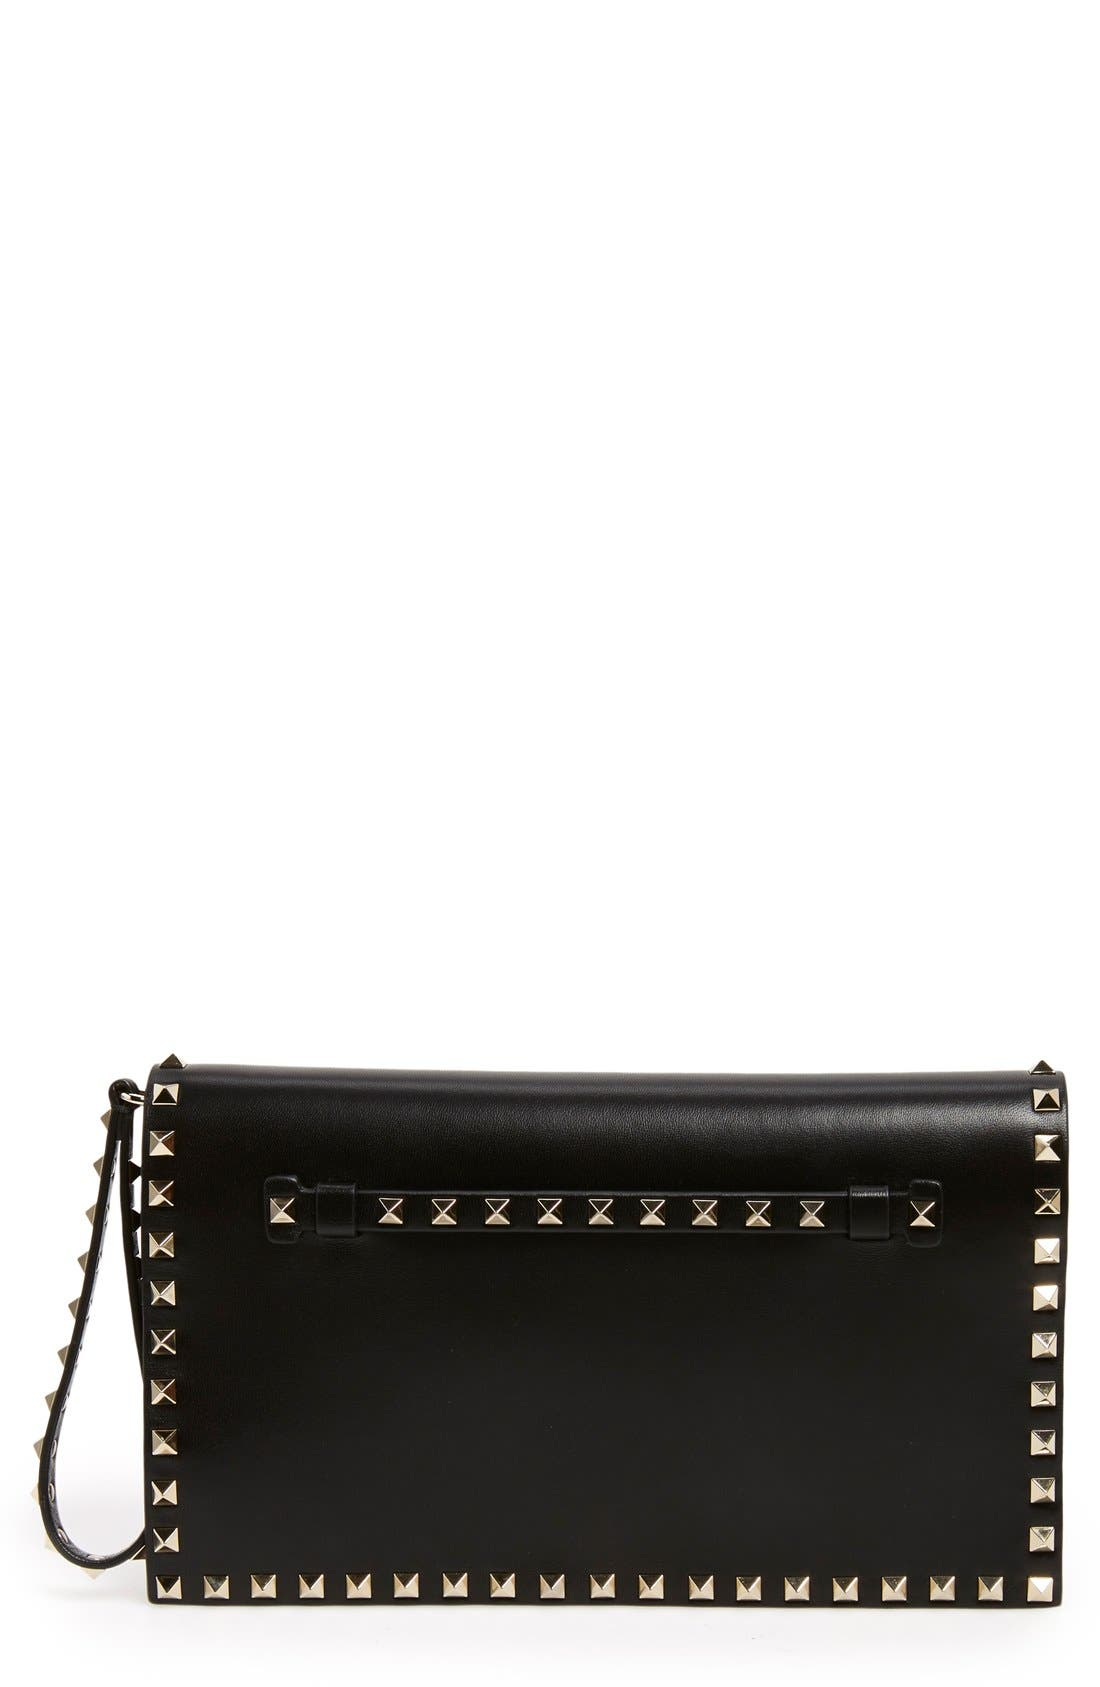 VALENTINO GARAVANI Rockstud Leather Flap Clutch, Main, color, BLACK